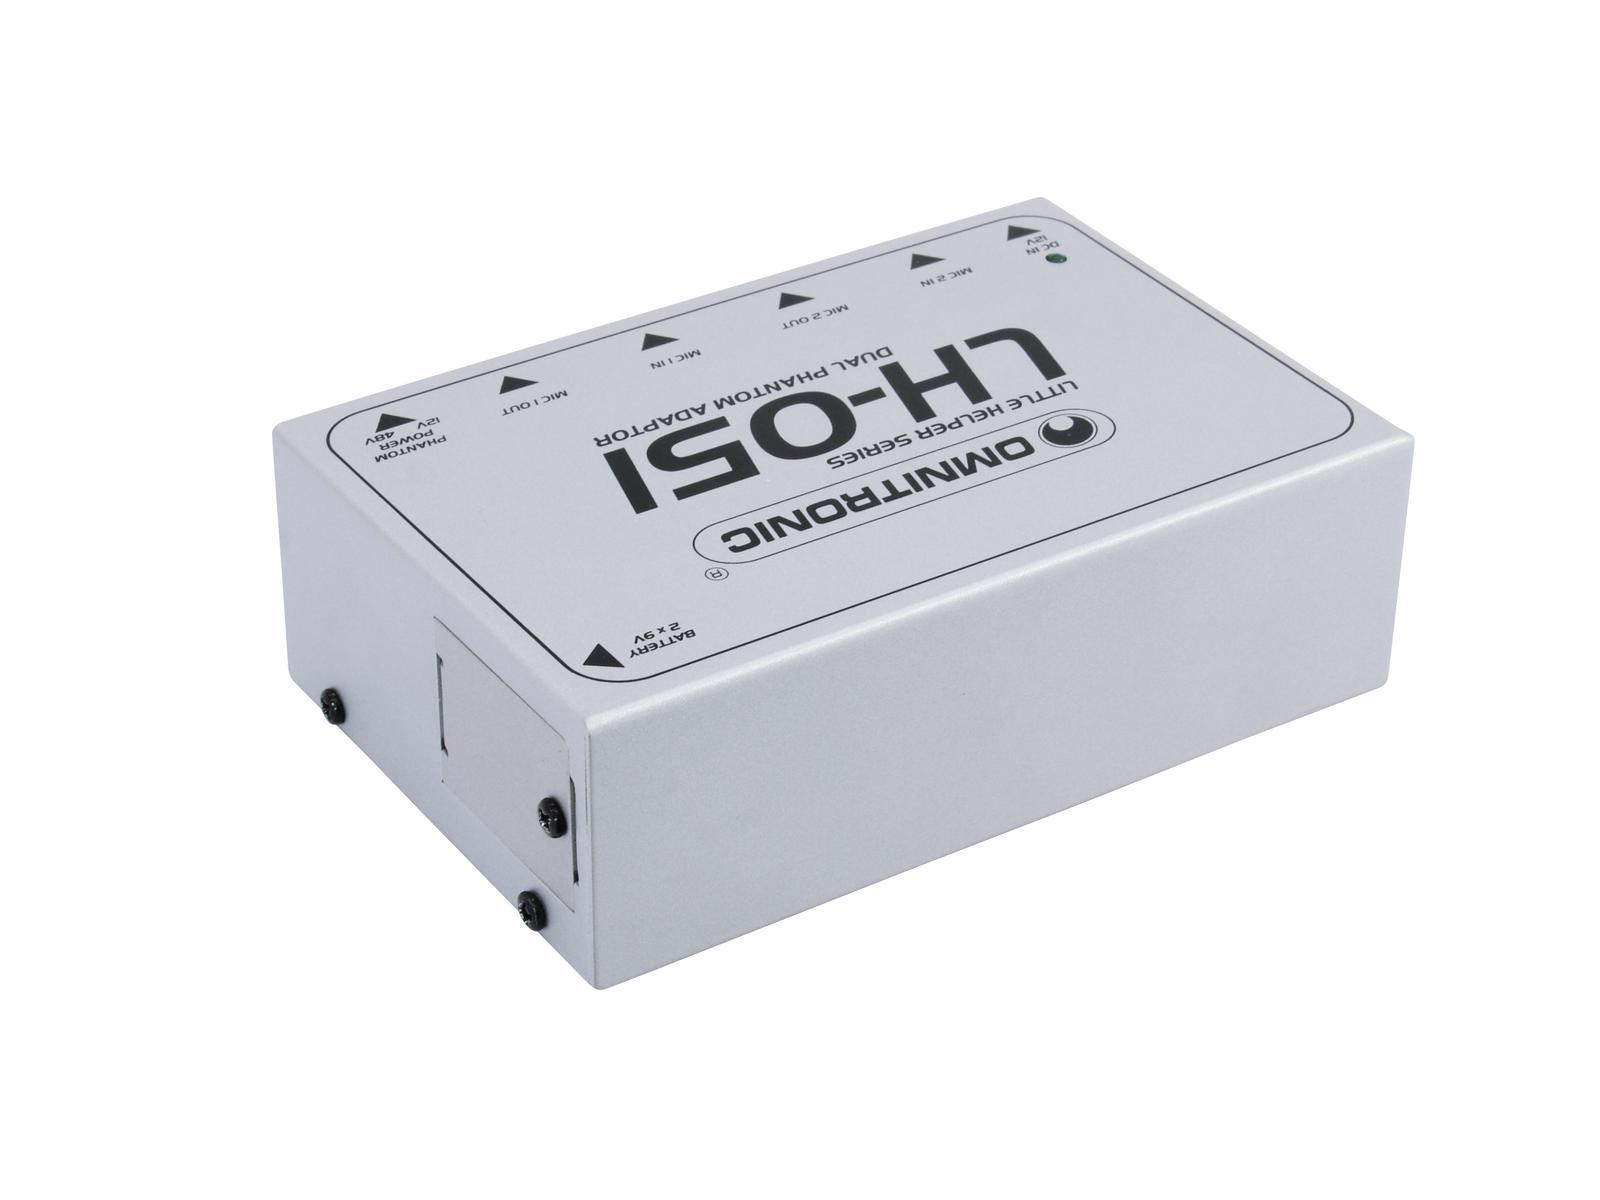 OMNITRONIC LH-051 Dual-Phantom-Speiseadapter